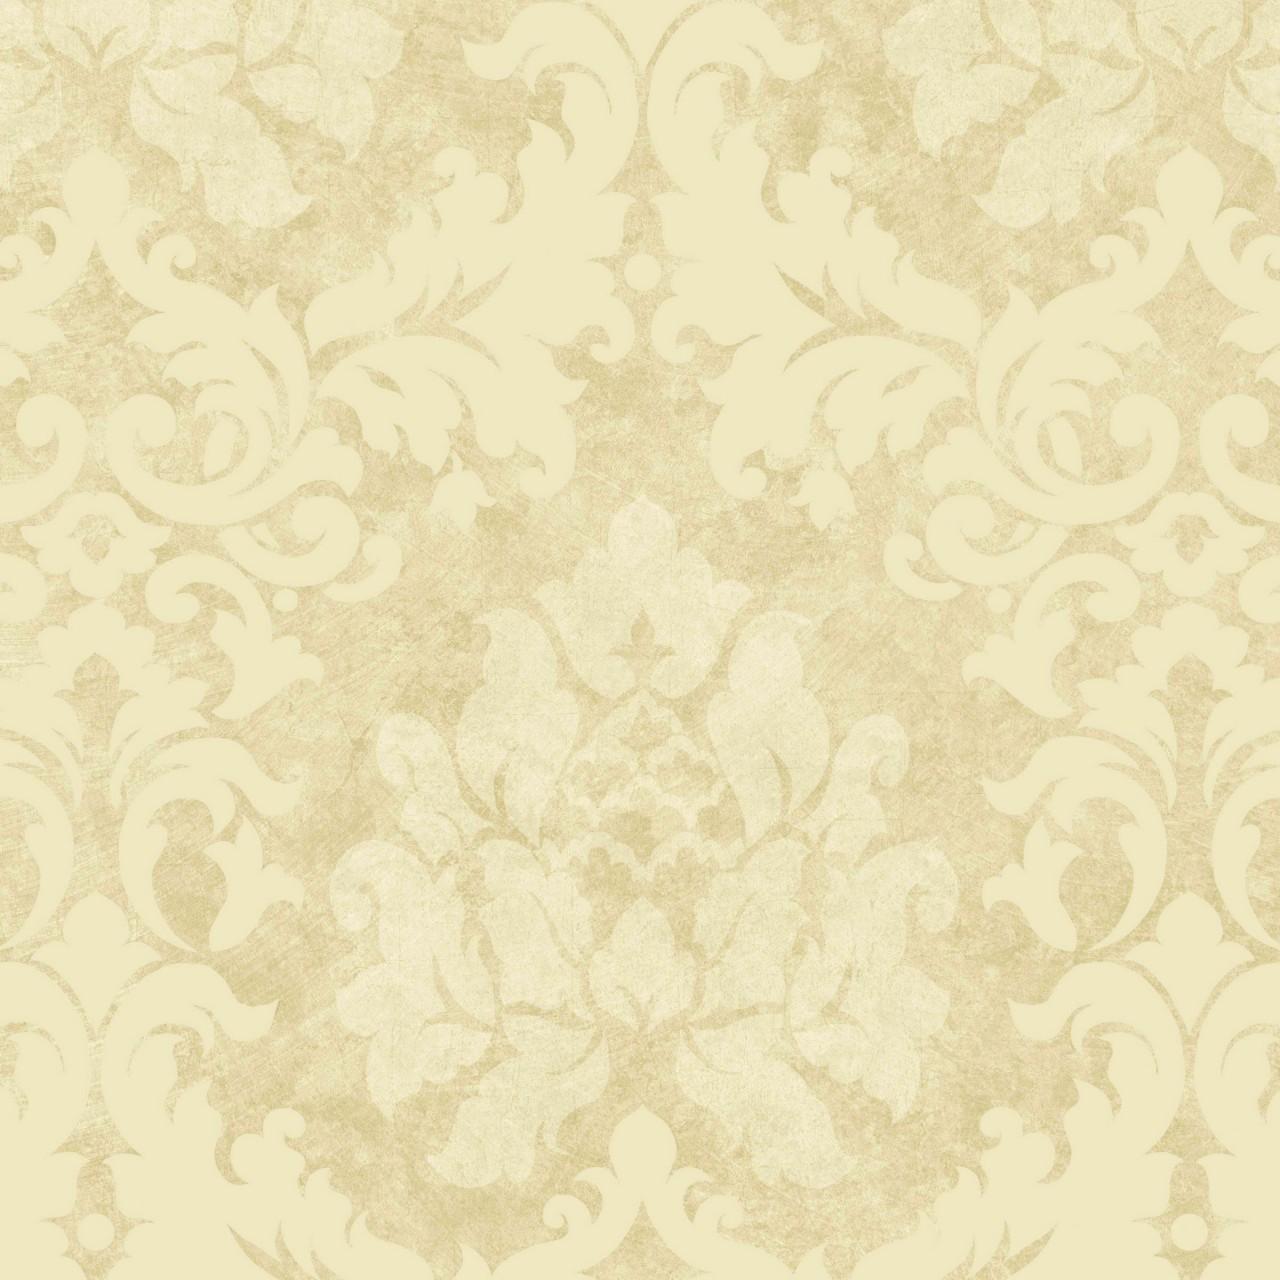 Beige Tan HAV40723 Haven Damask Wallpaper   Traditional Wallpaper 1280x1280